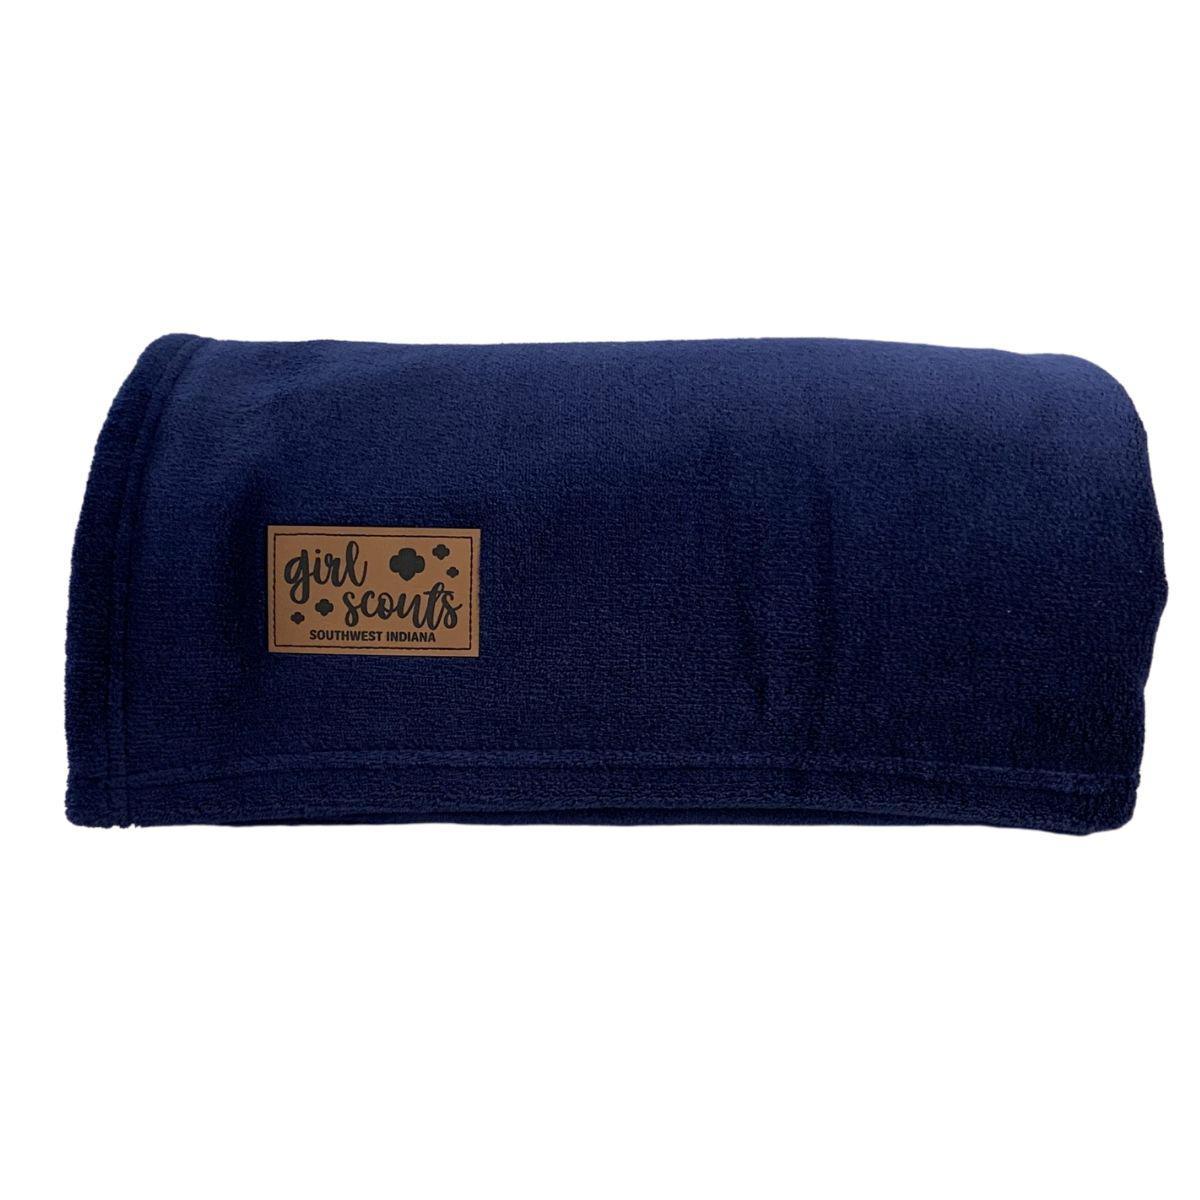 GSSI Plush Blanket